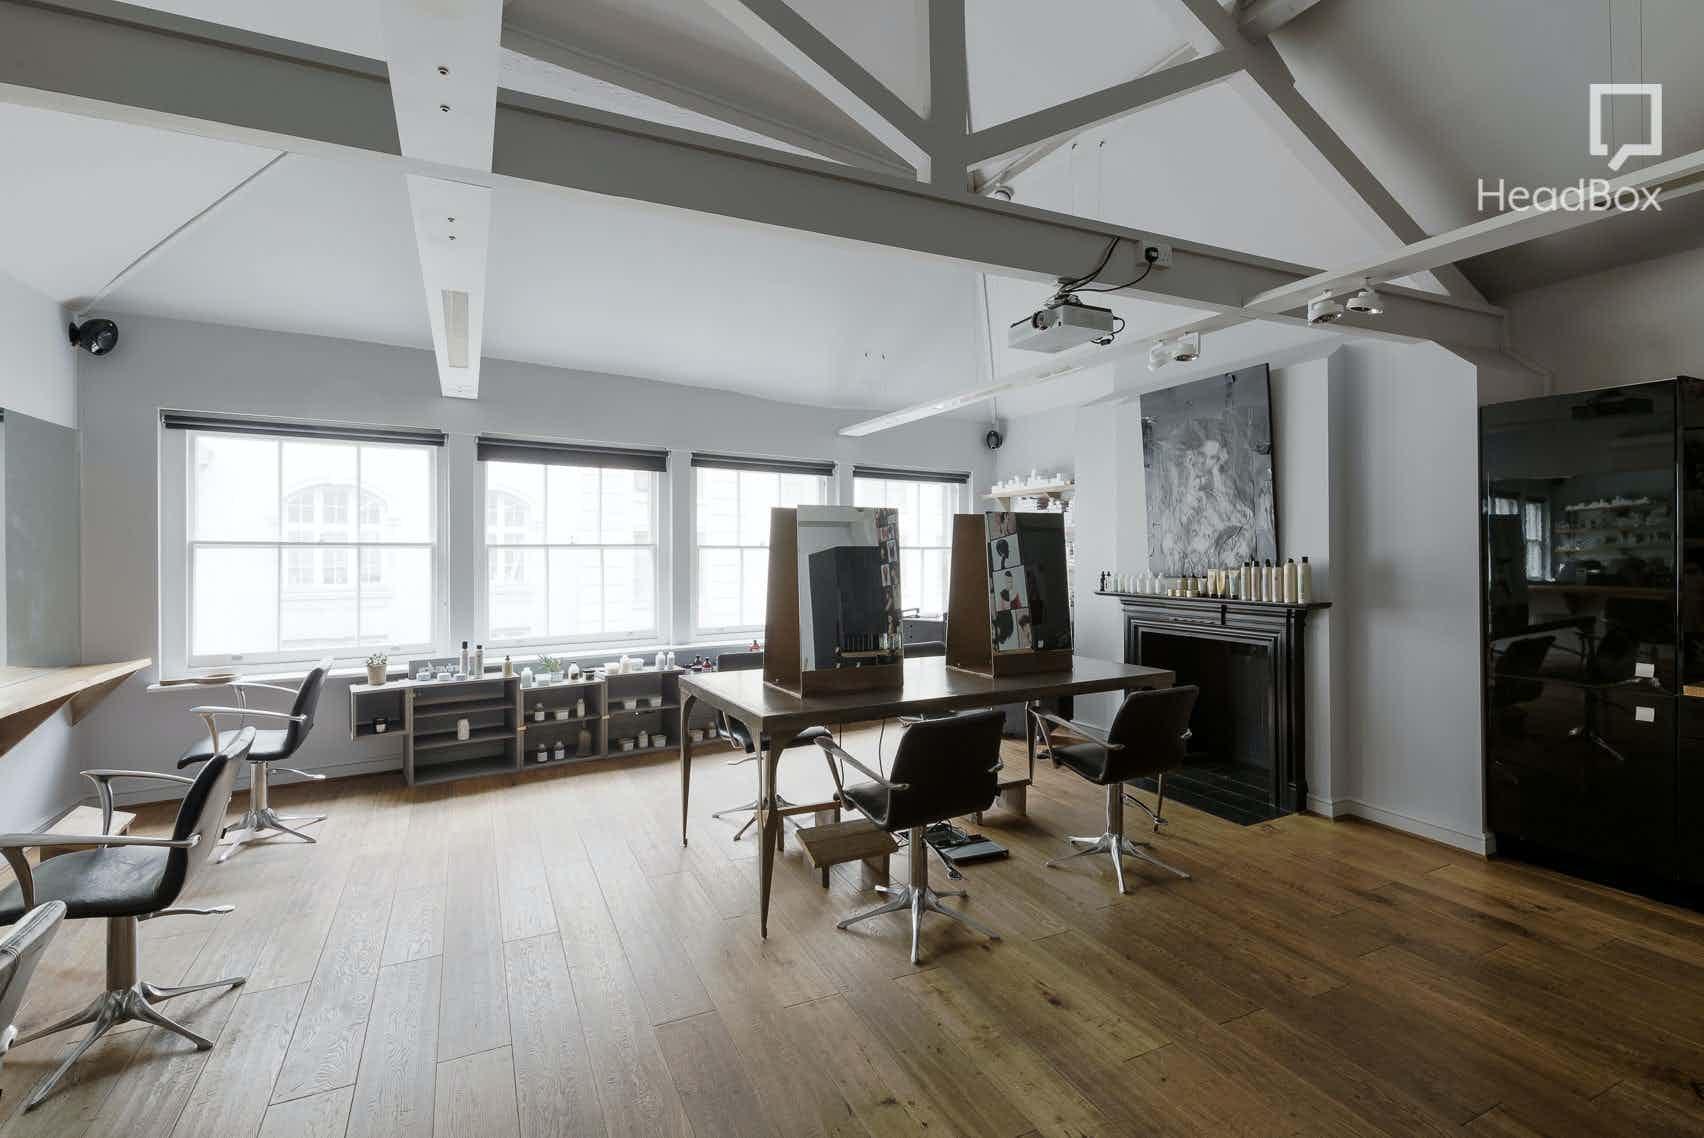 Book Loft Space at Ena Salon  A London Venue for Hire – HeadBox